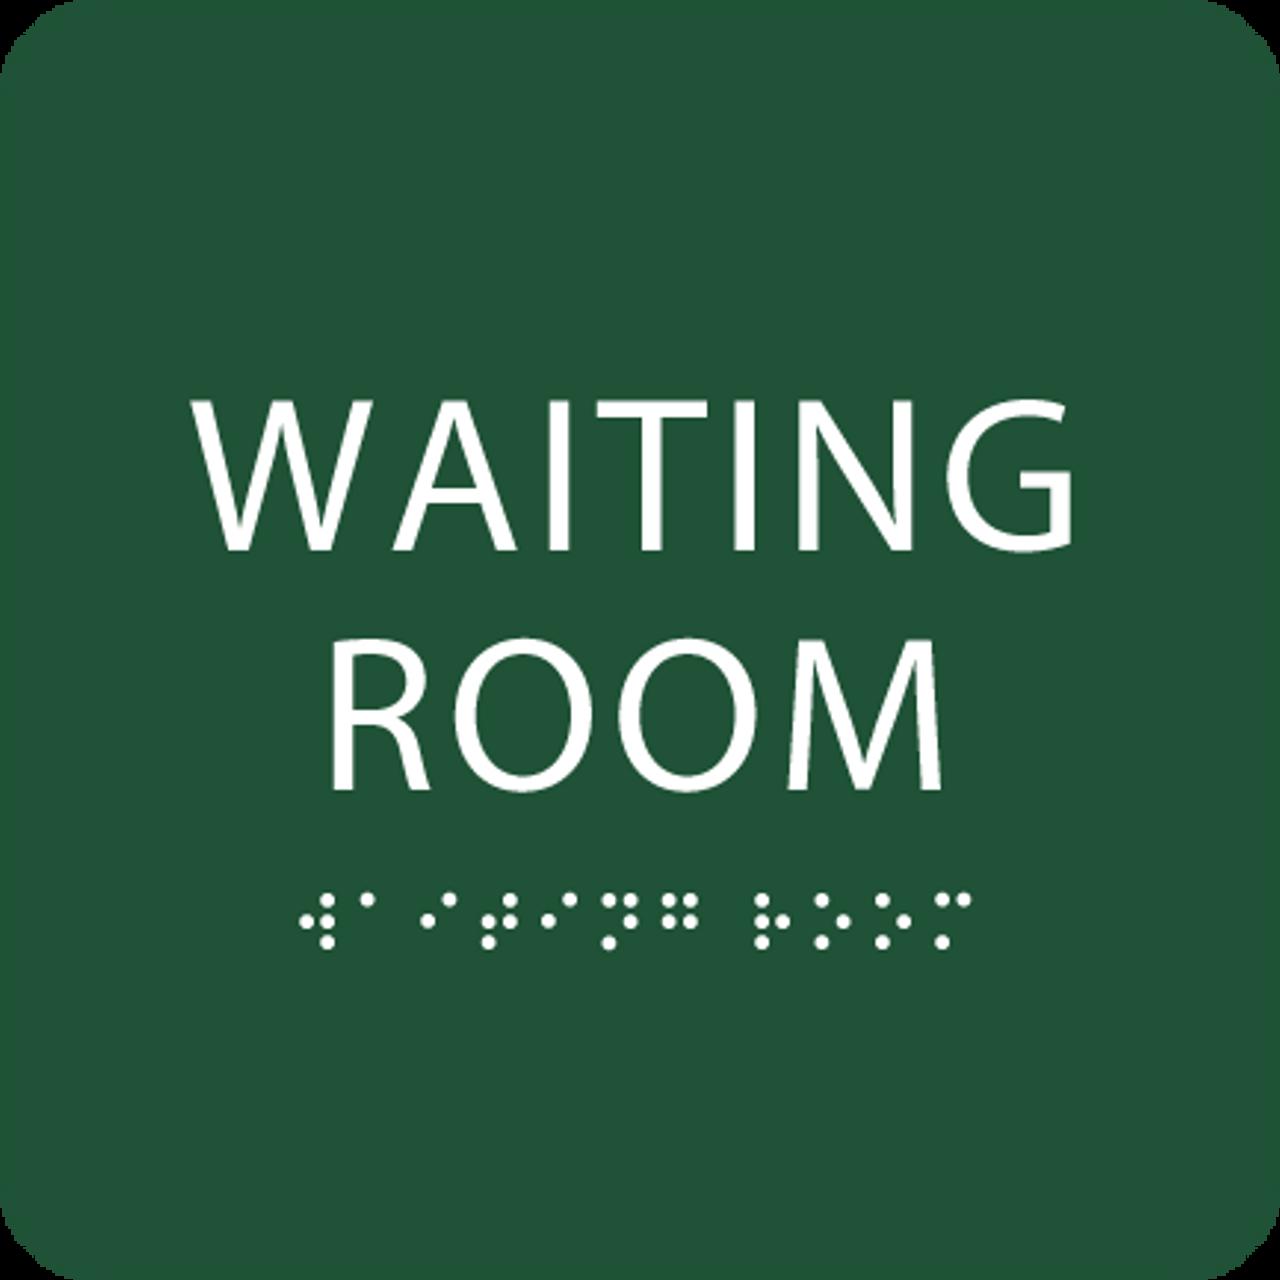 Green Waiting Room ADA Sign